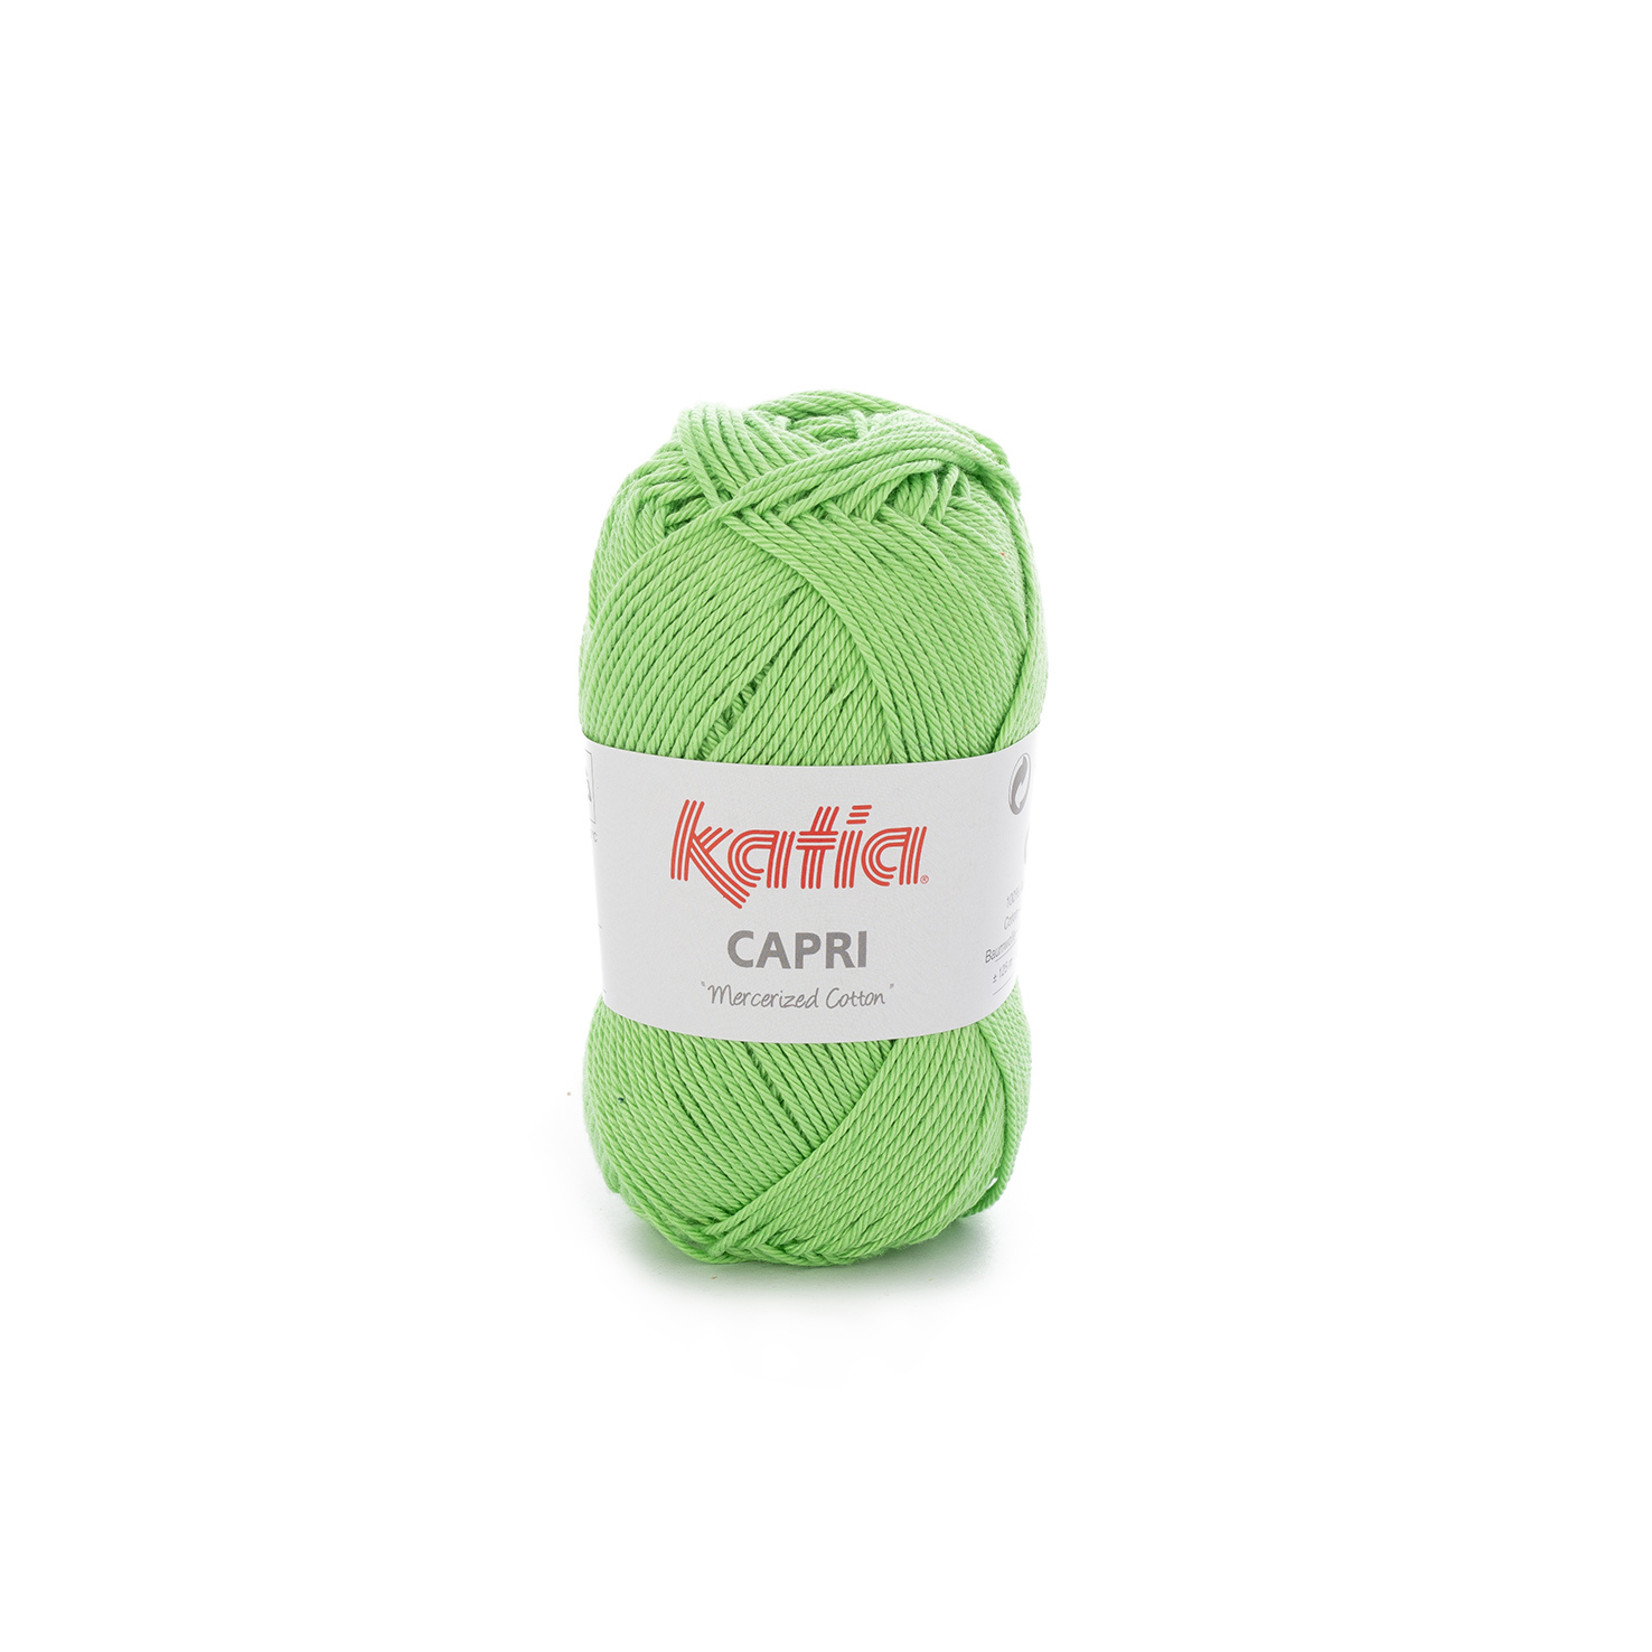 Katia Katia Capri - kleur 149 Briljantgroen - 50 gr. = 125 m. - 100% katoen